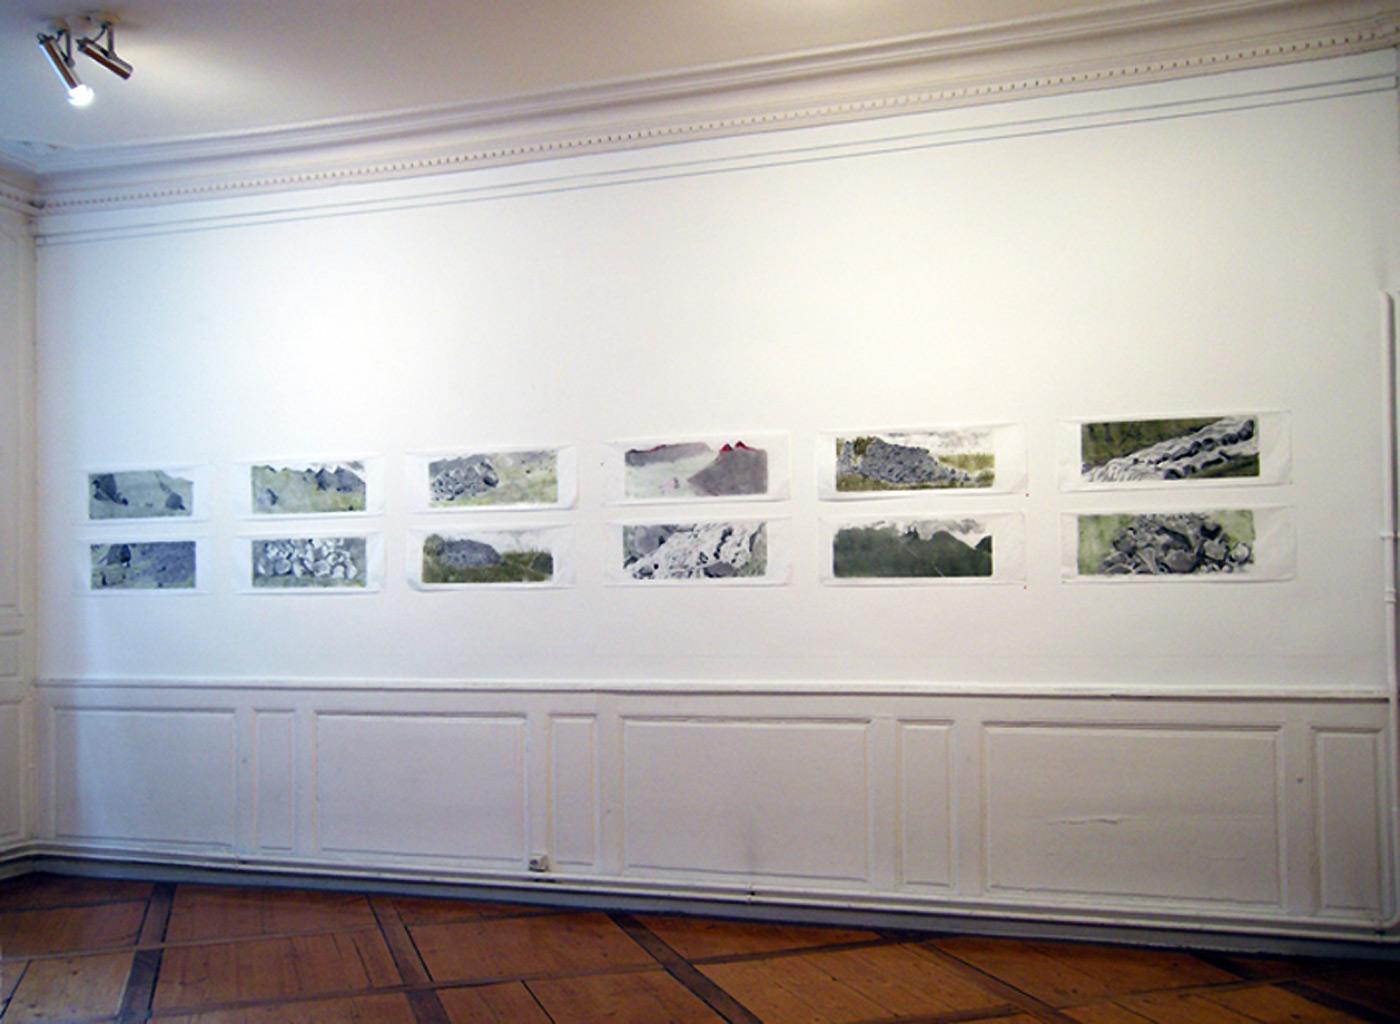 Exposition 2009 - Galerie Michel Foex